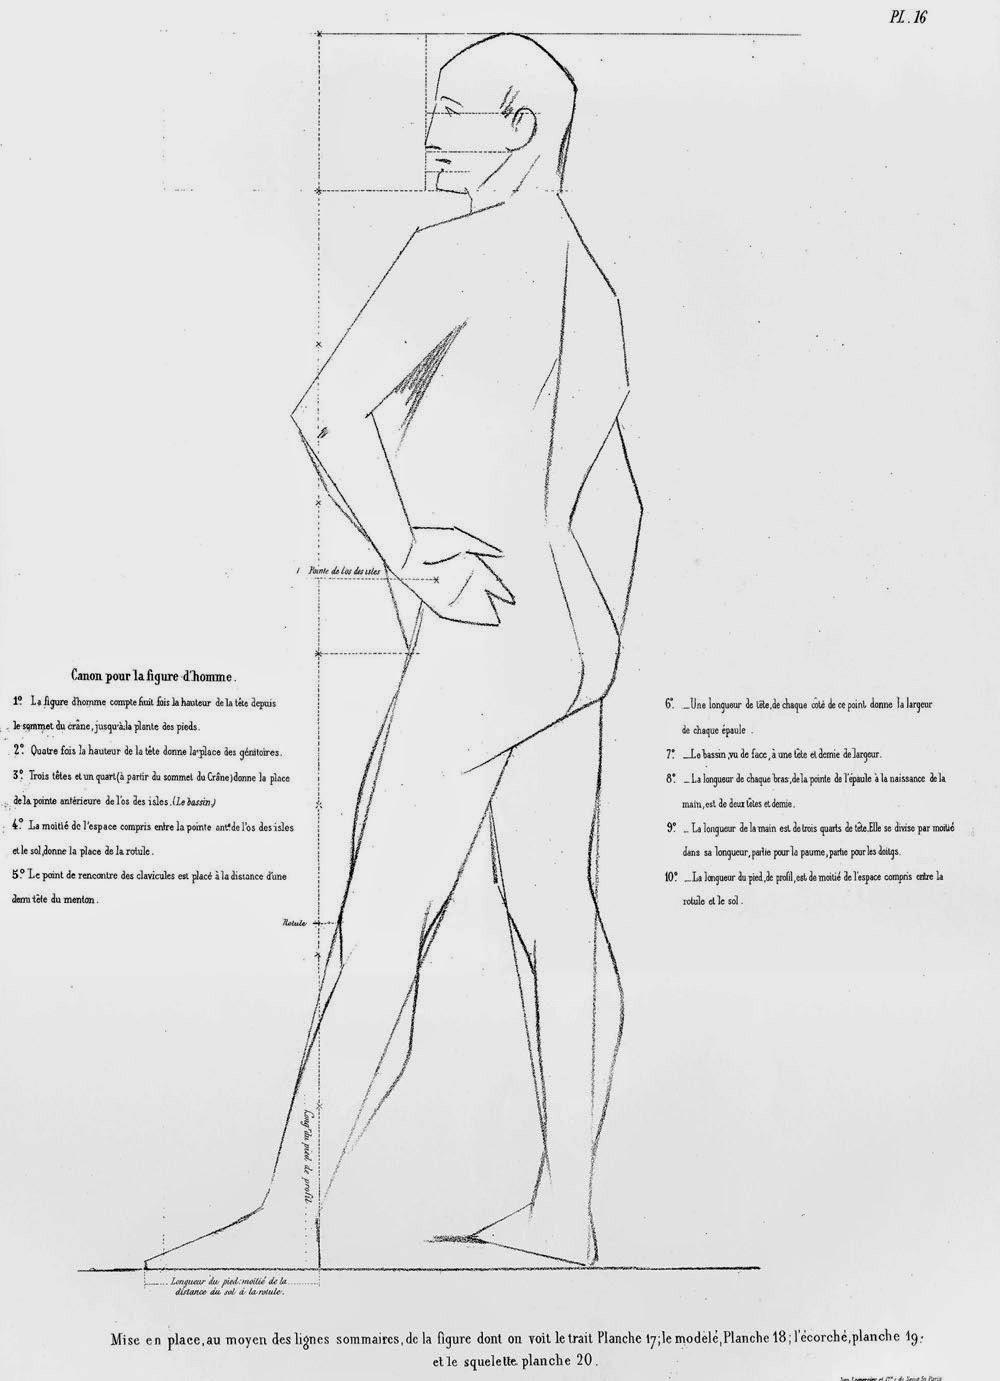 Gurney Journey: Yvon's Academic Drawing Manual